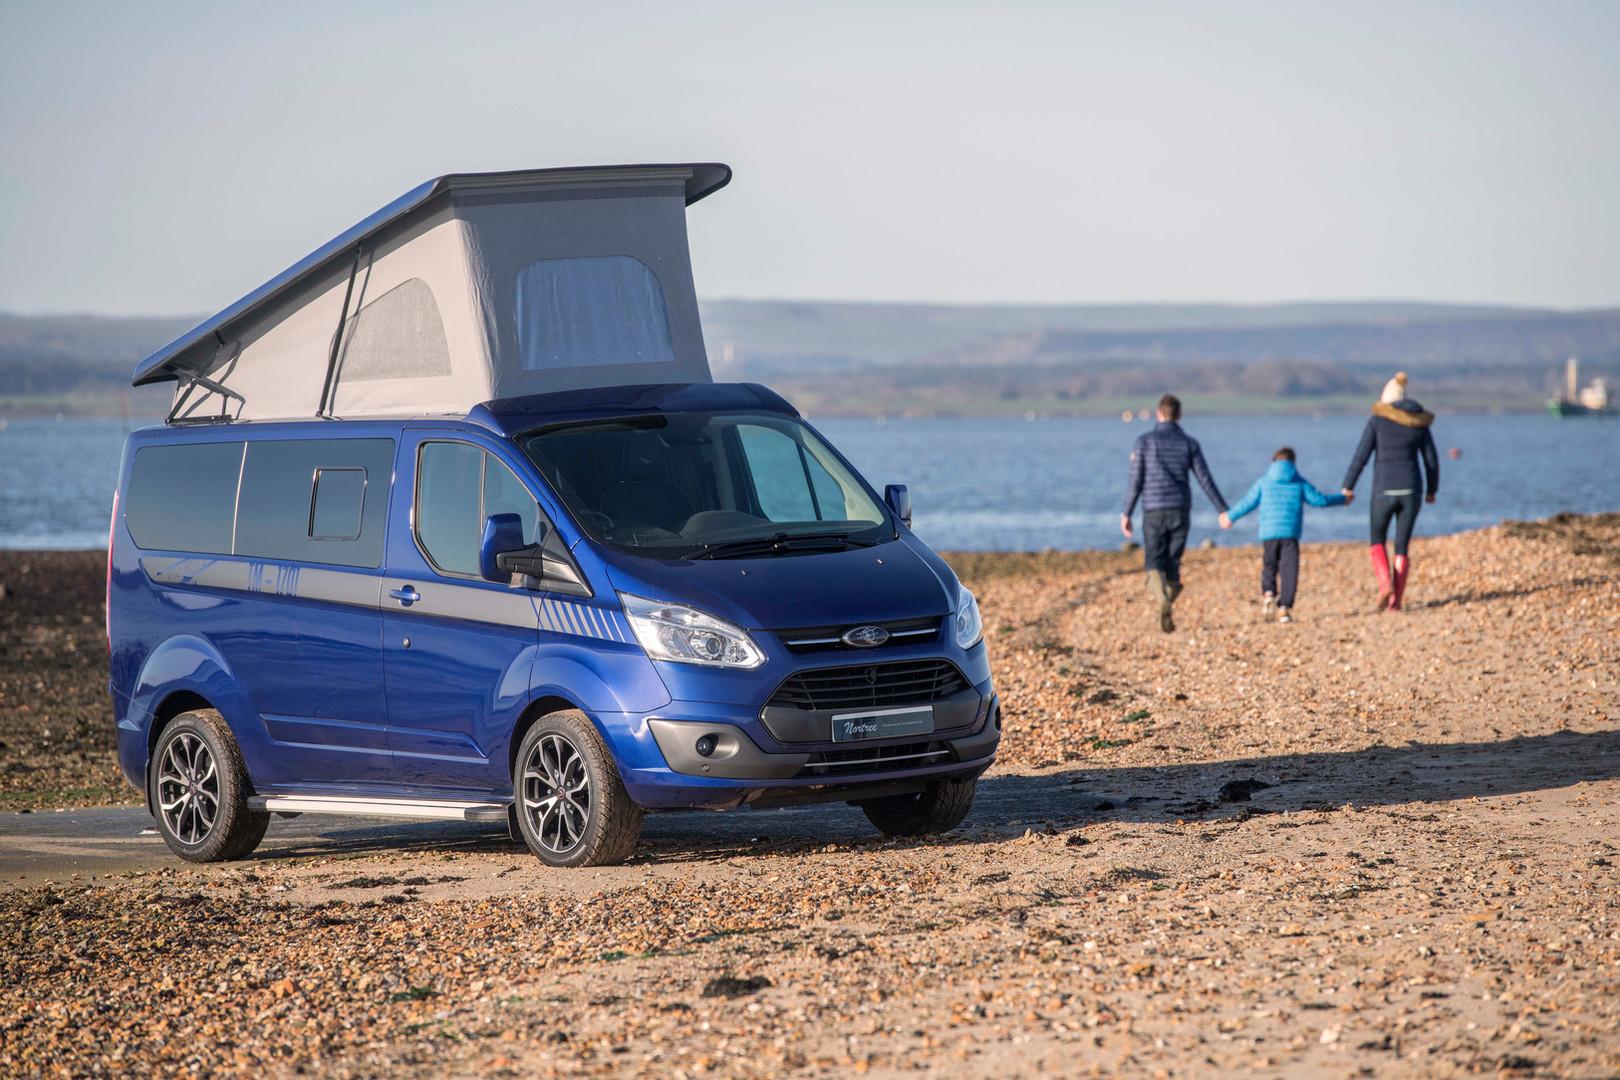 A new bespoke campervan ad shot